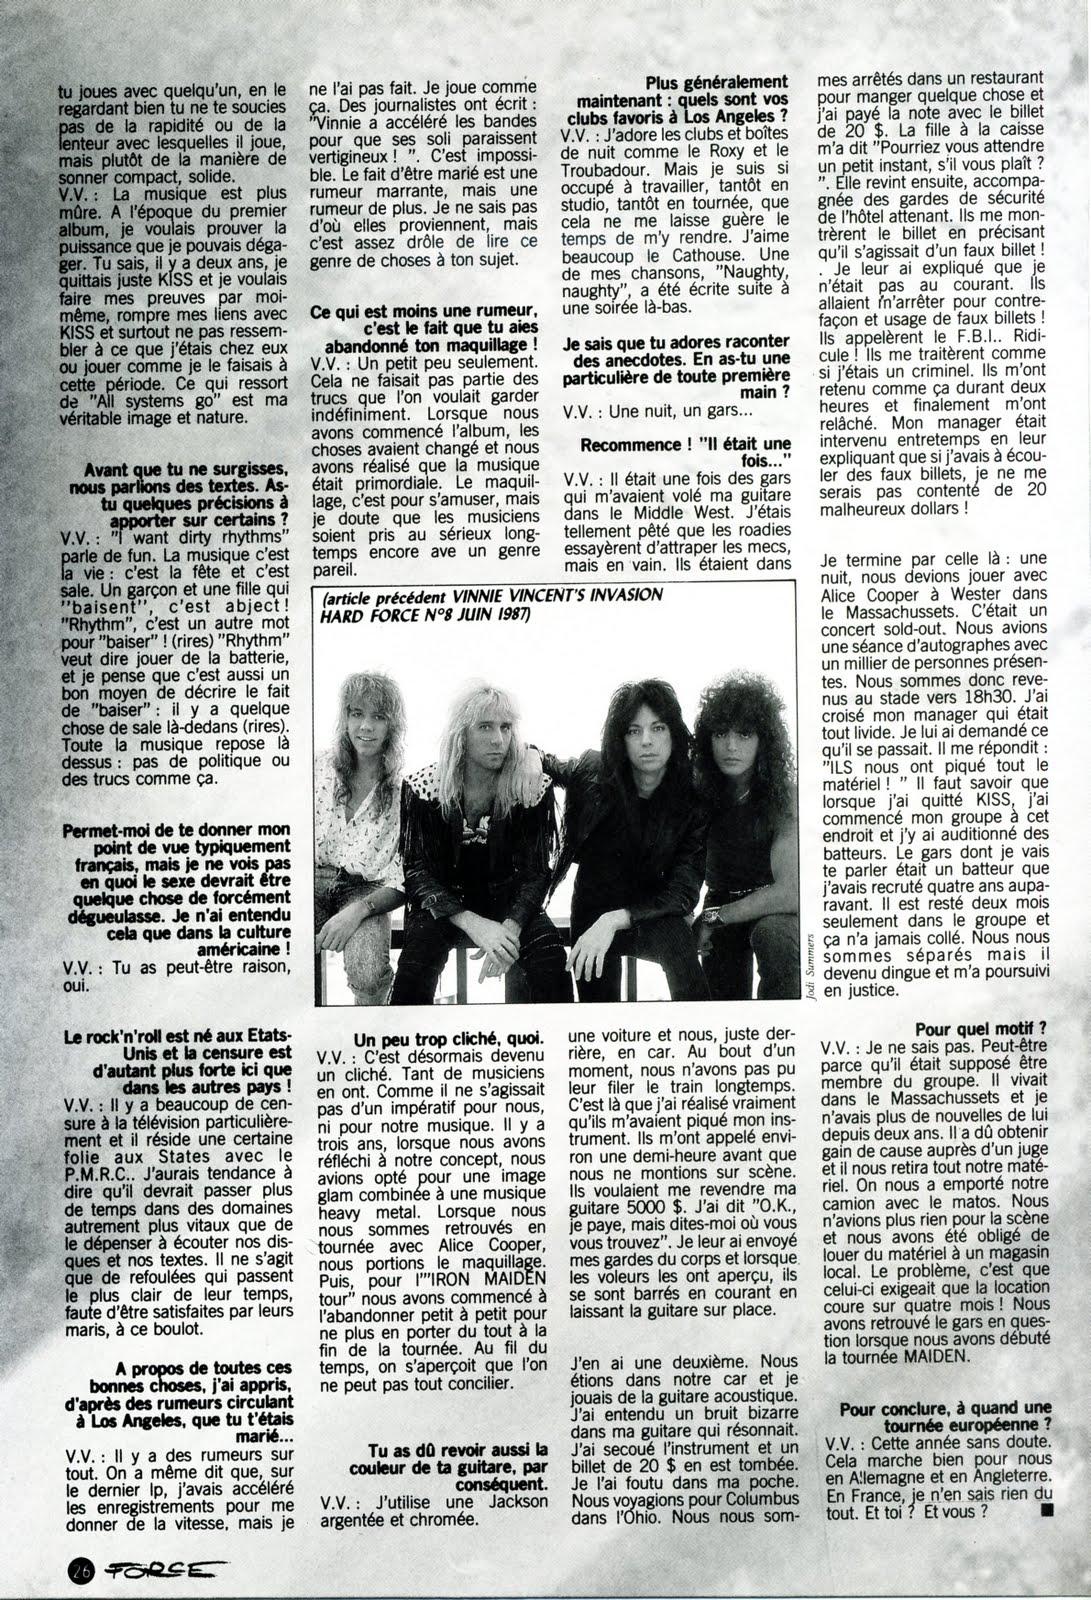 Vinnie Vincent - Page 10 1988-HardForce-vele-3659